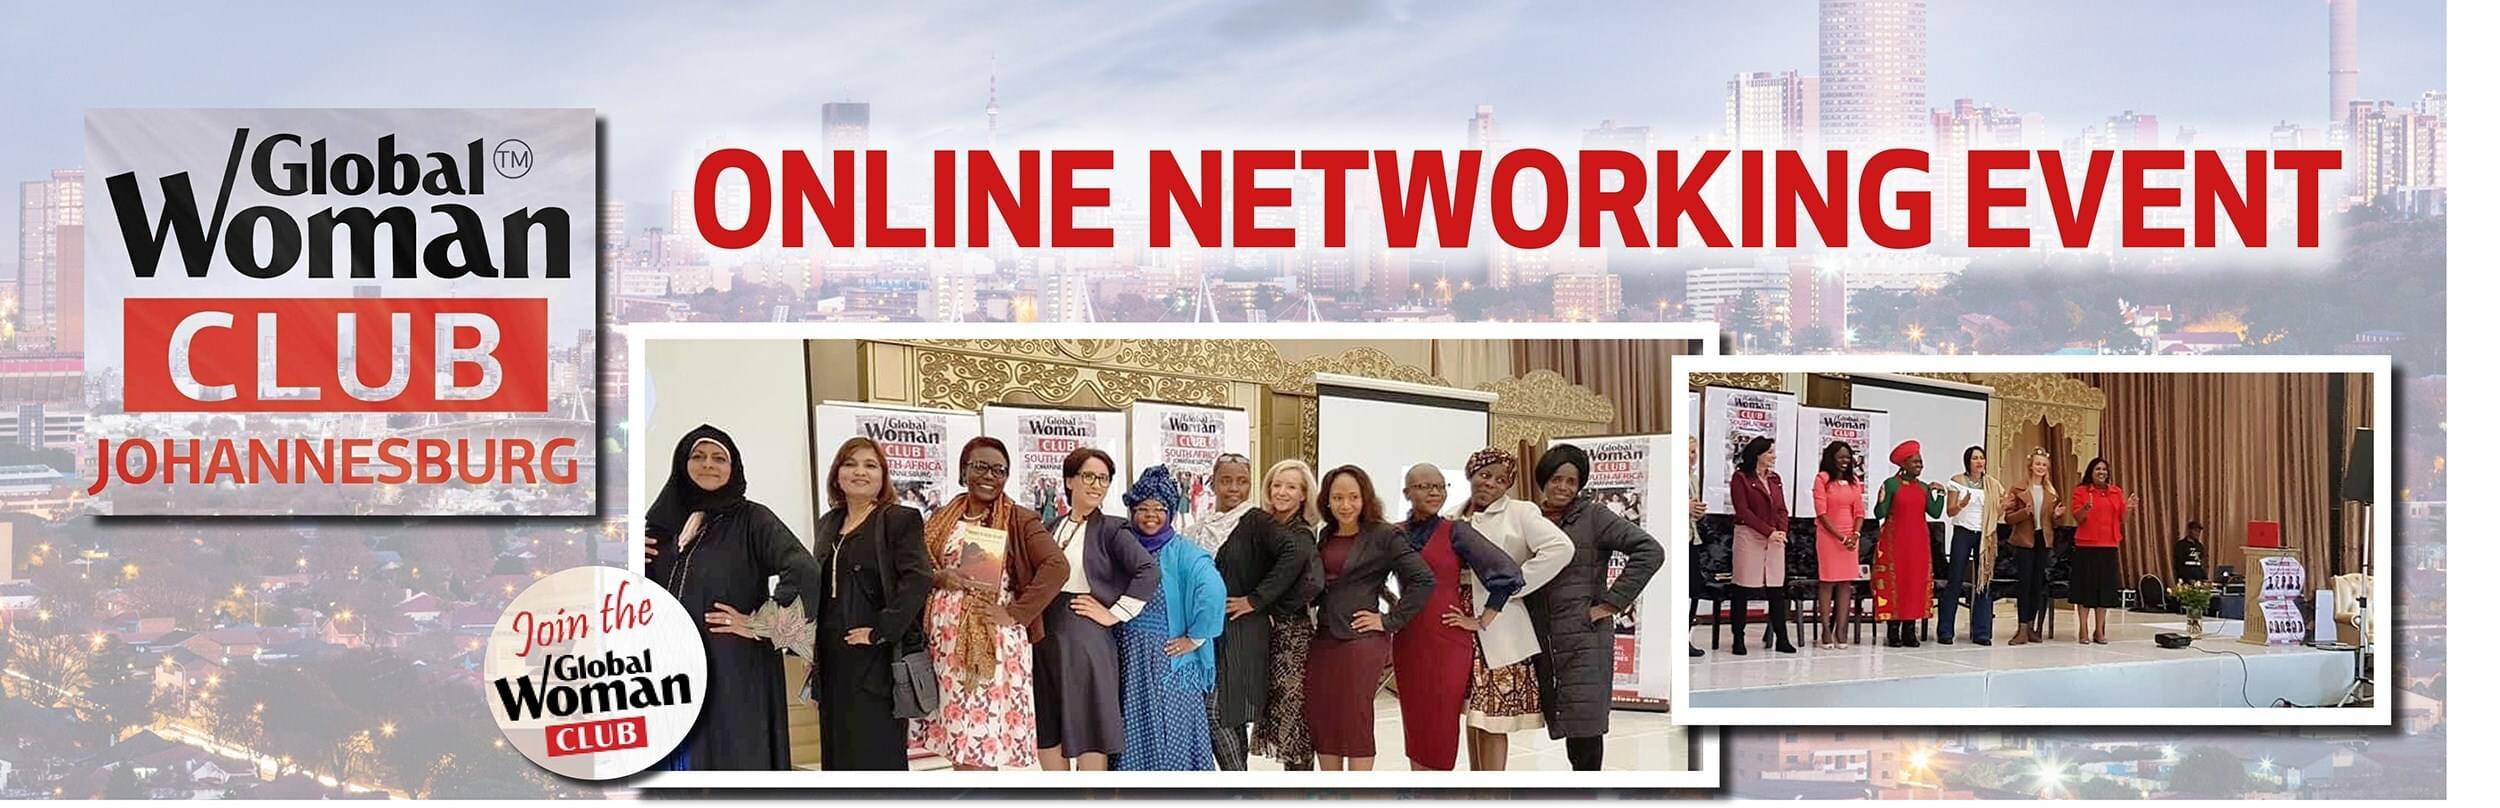 GLOBAL WOMAN CLUB Johannesburg: BUSINESS NETWORKING MEETING - January